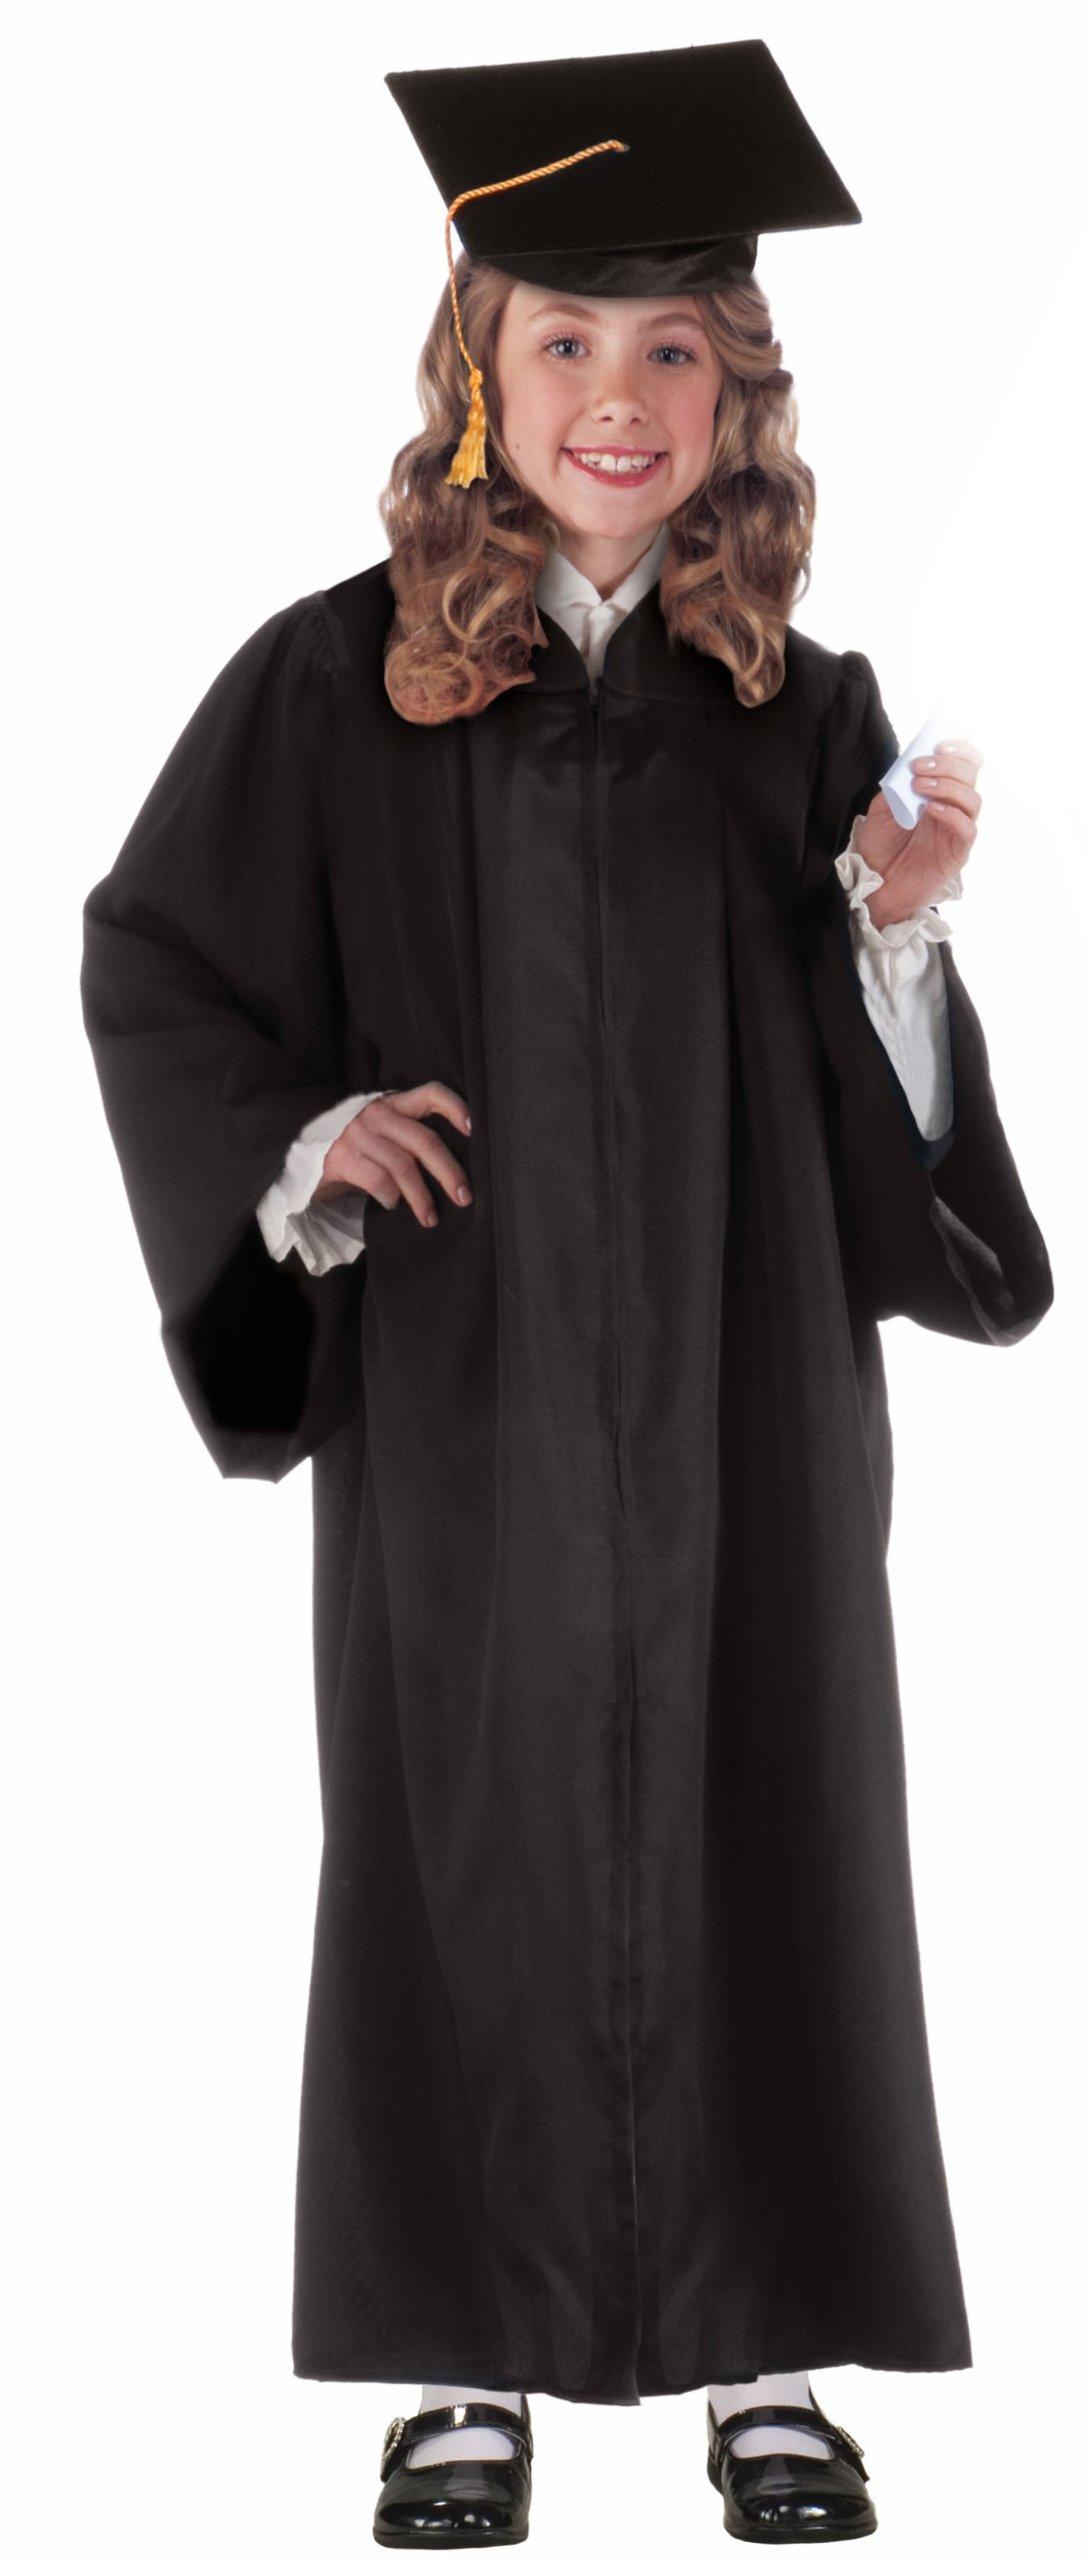 Forum Novelties Children's Graduation Robe Costume Accessory, Black (Hat Not Included)